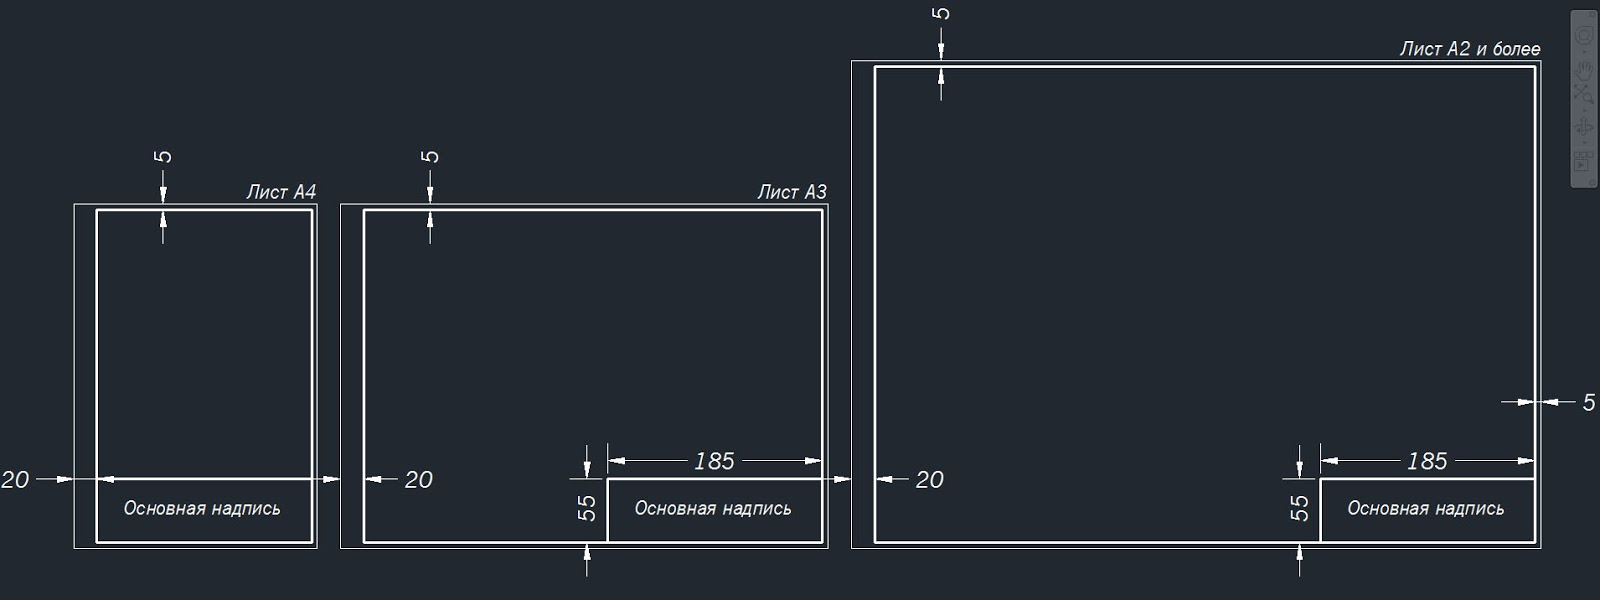 стандартные рамки для фото размеры